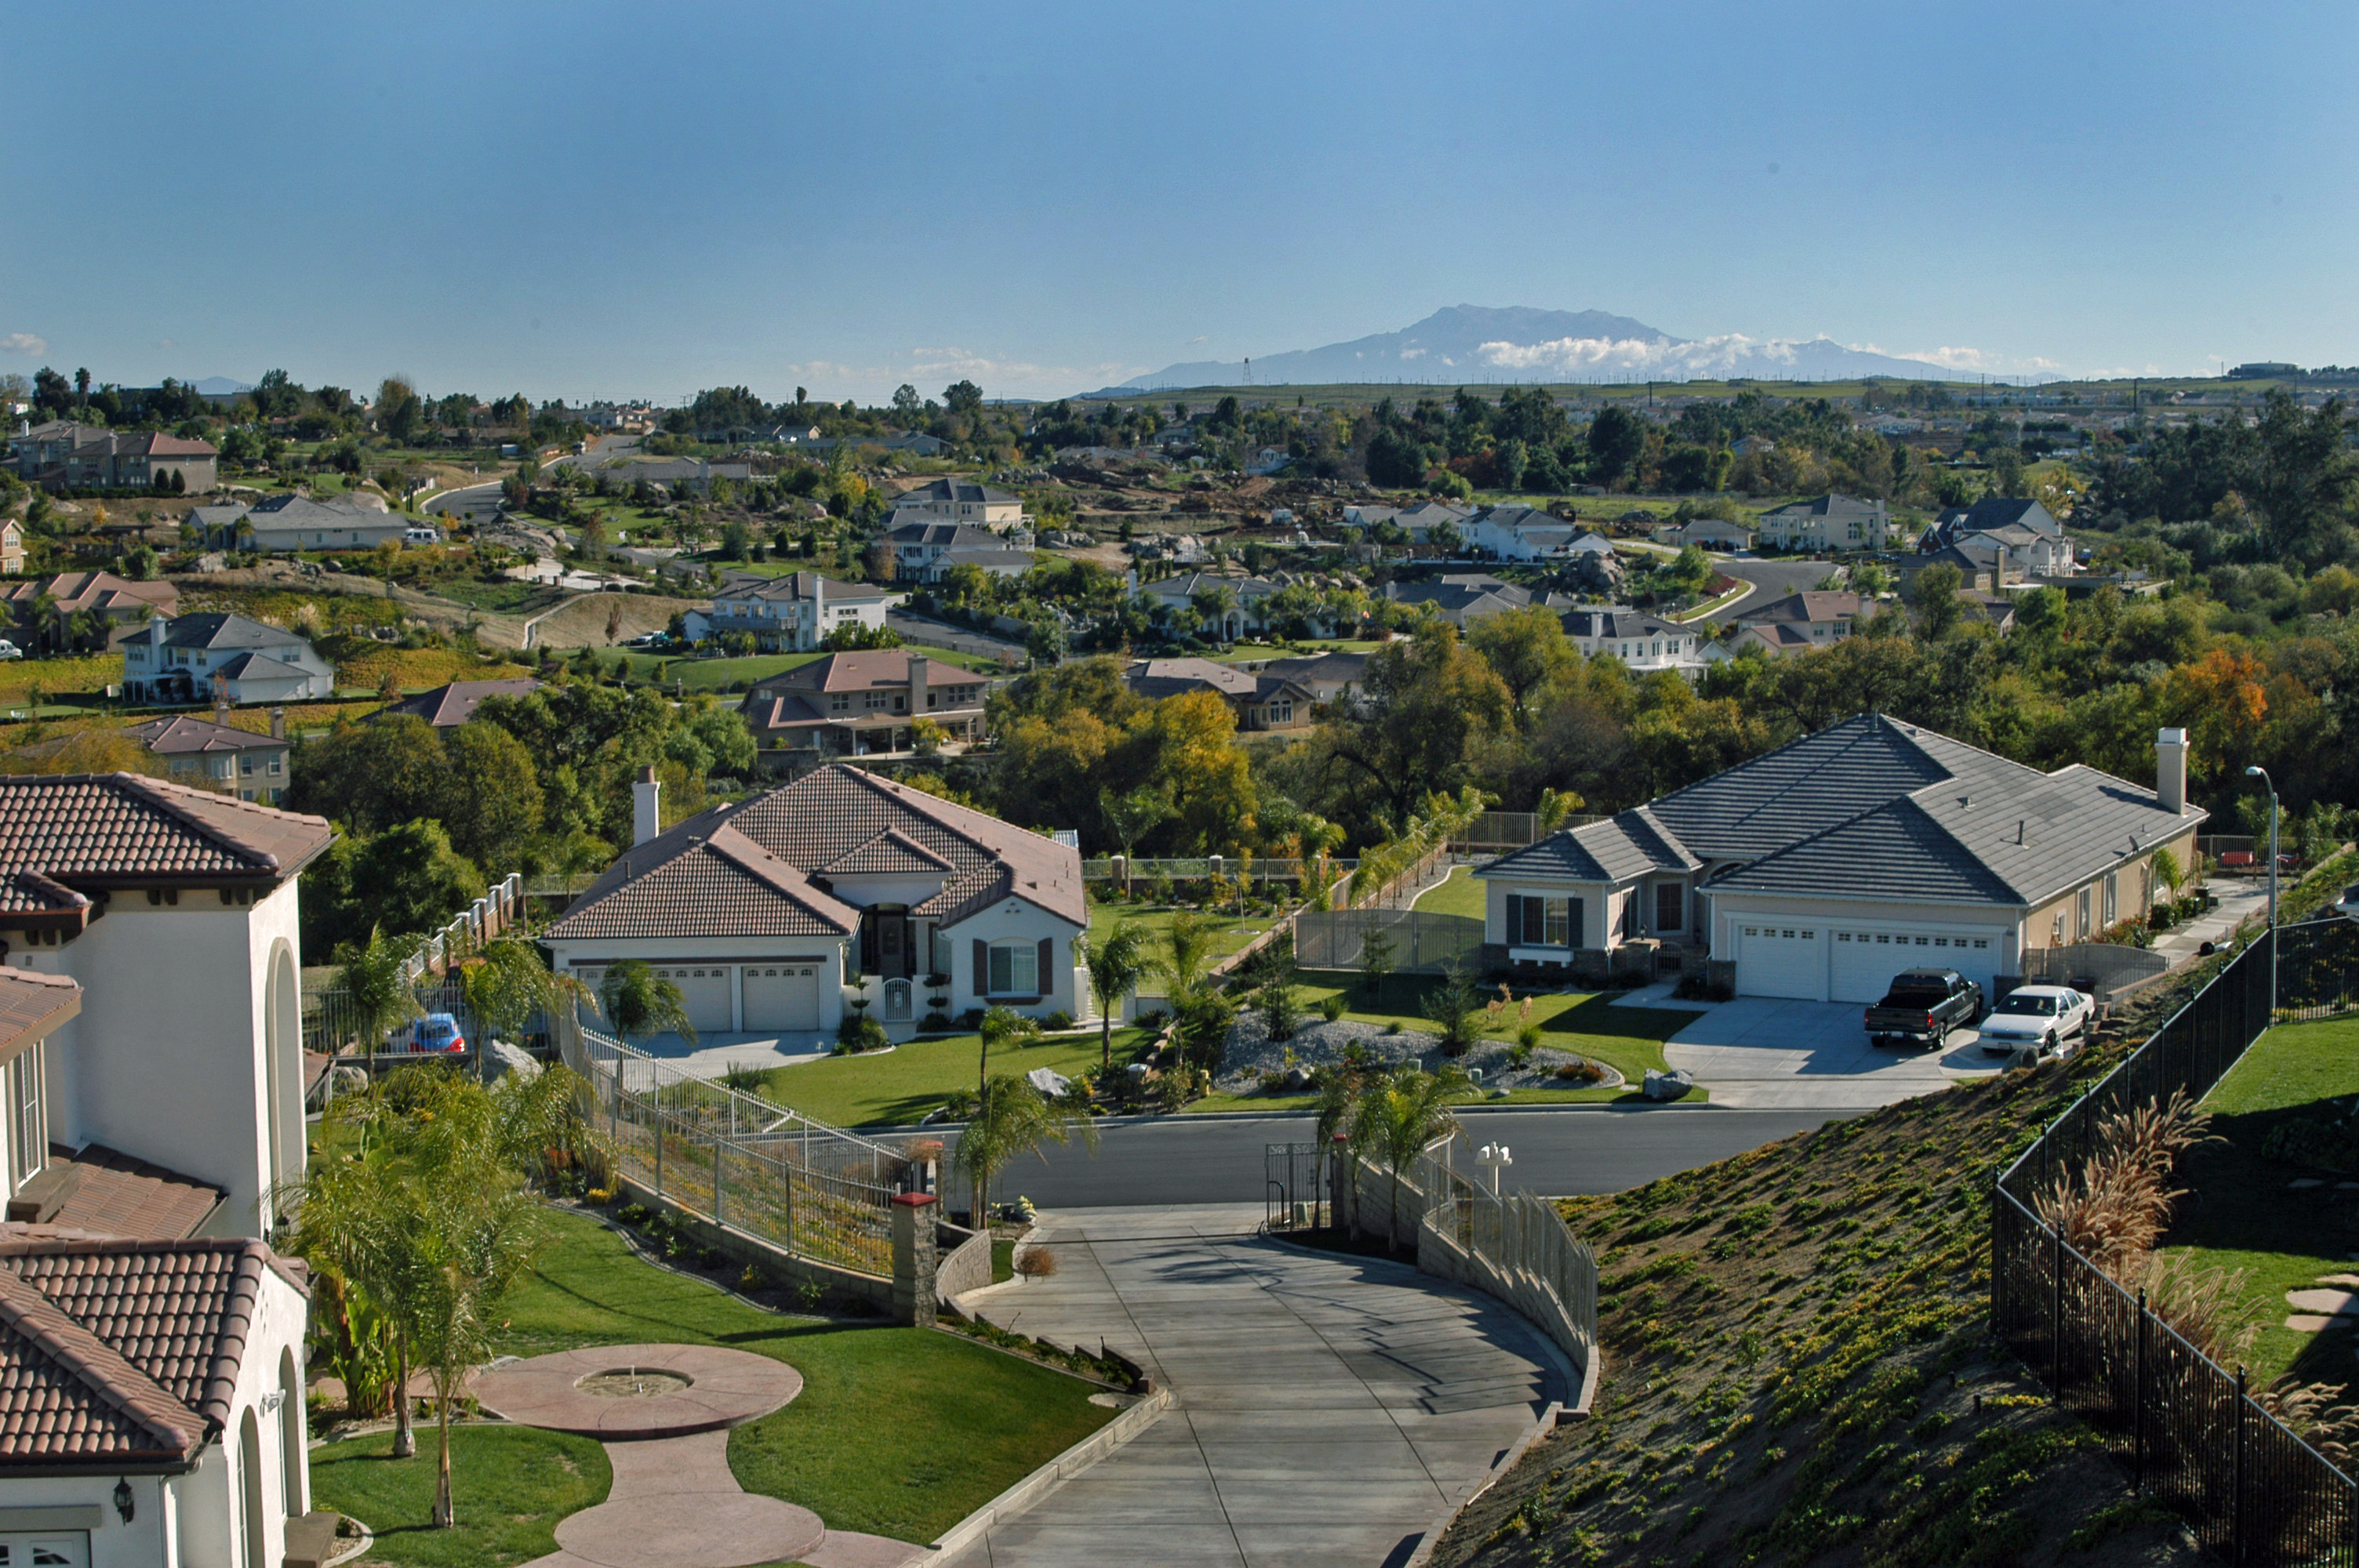 City Of Riverside California Bing Images